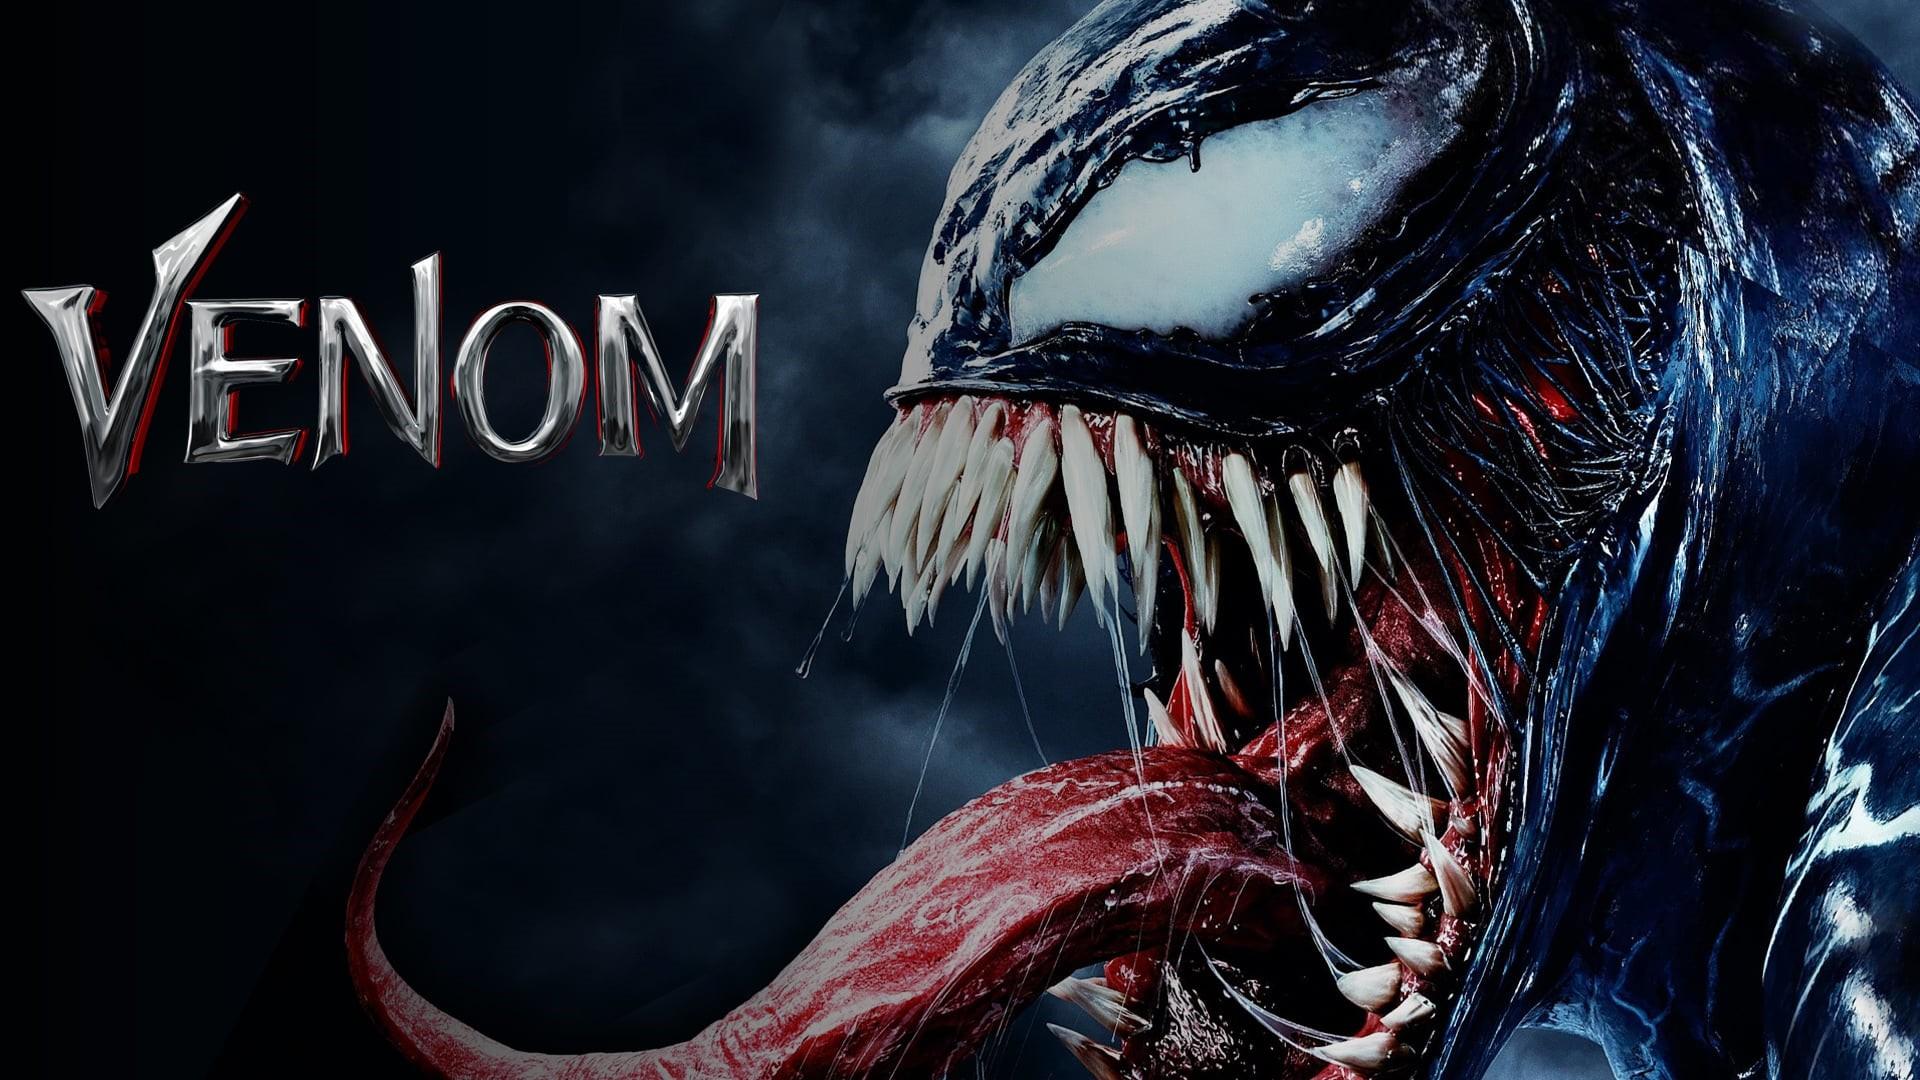 Venom 720p wallpaper